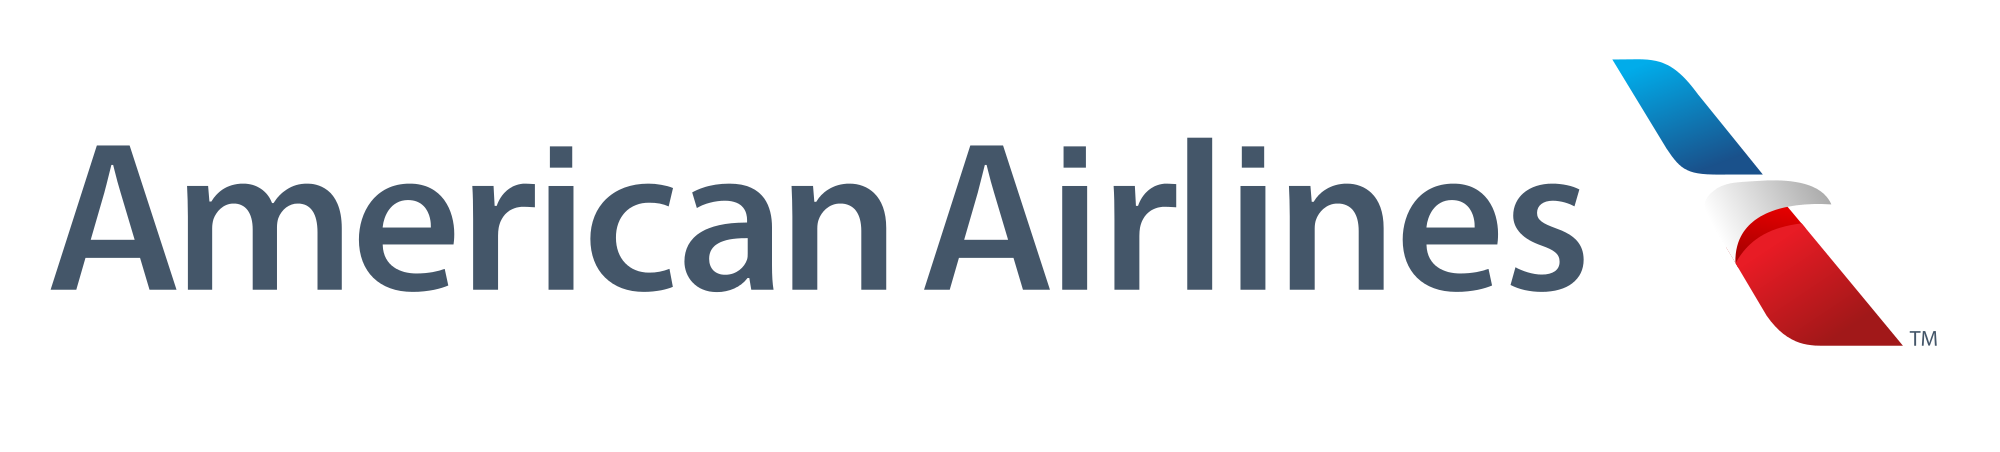 American Airline Logos Images | Joy Studio Design Gallery ...